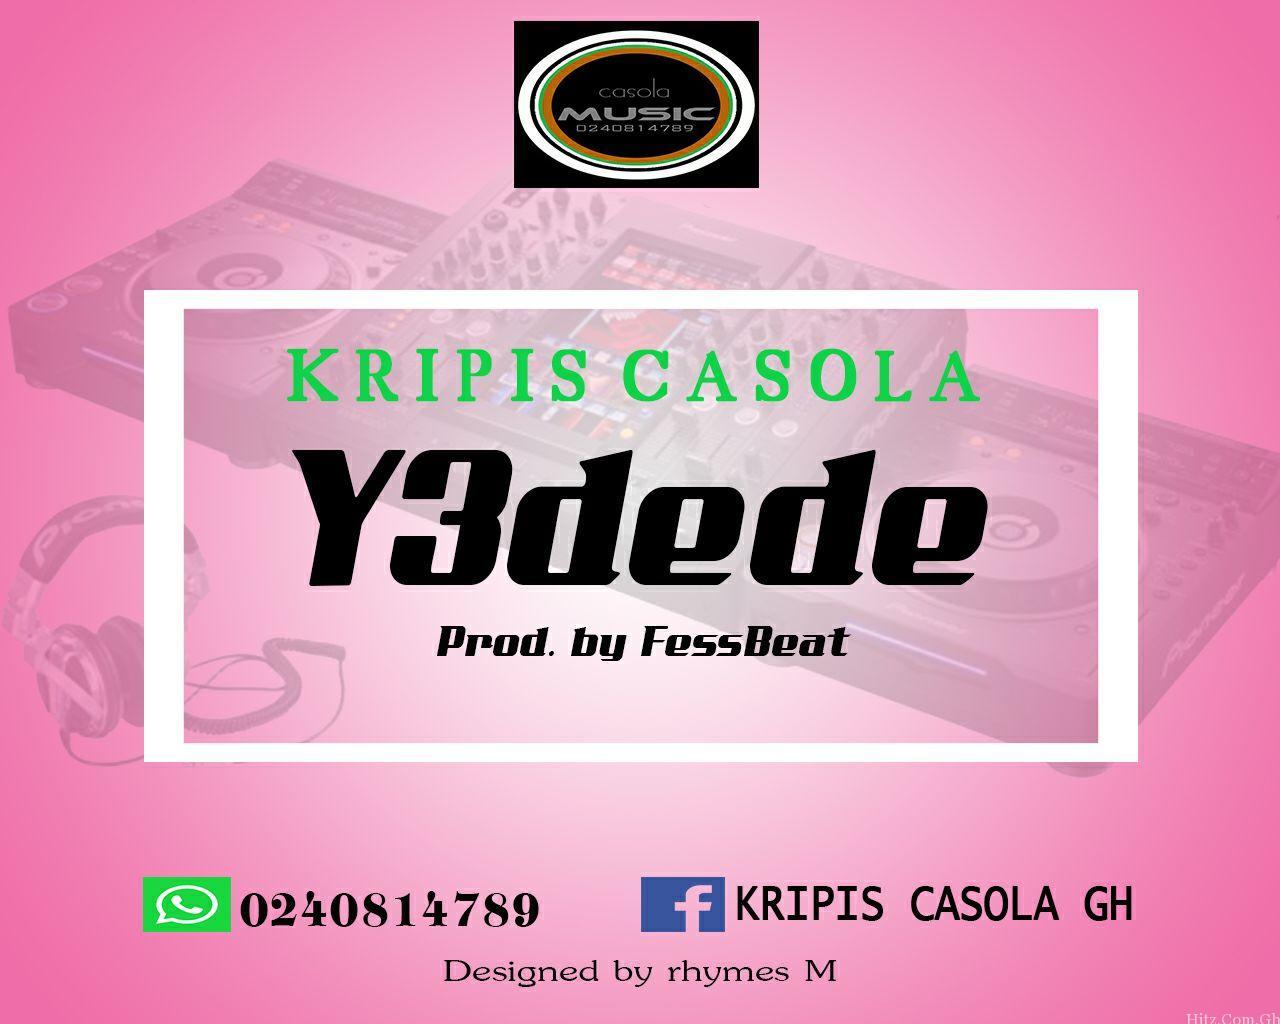 Krispis Casola Yedede Prod